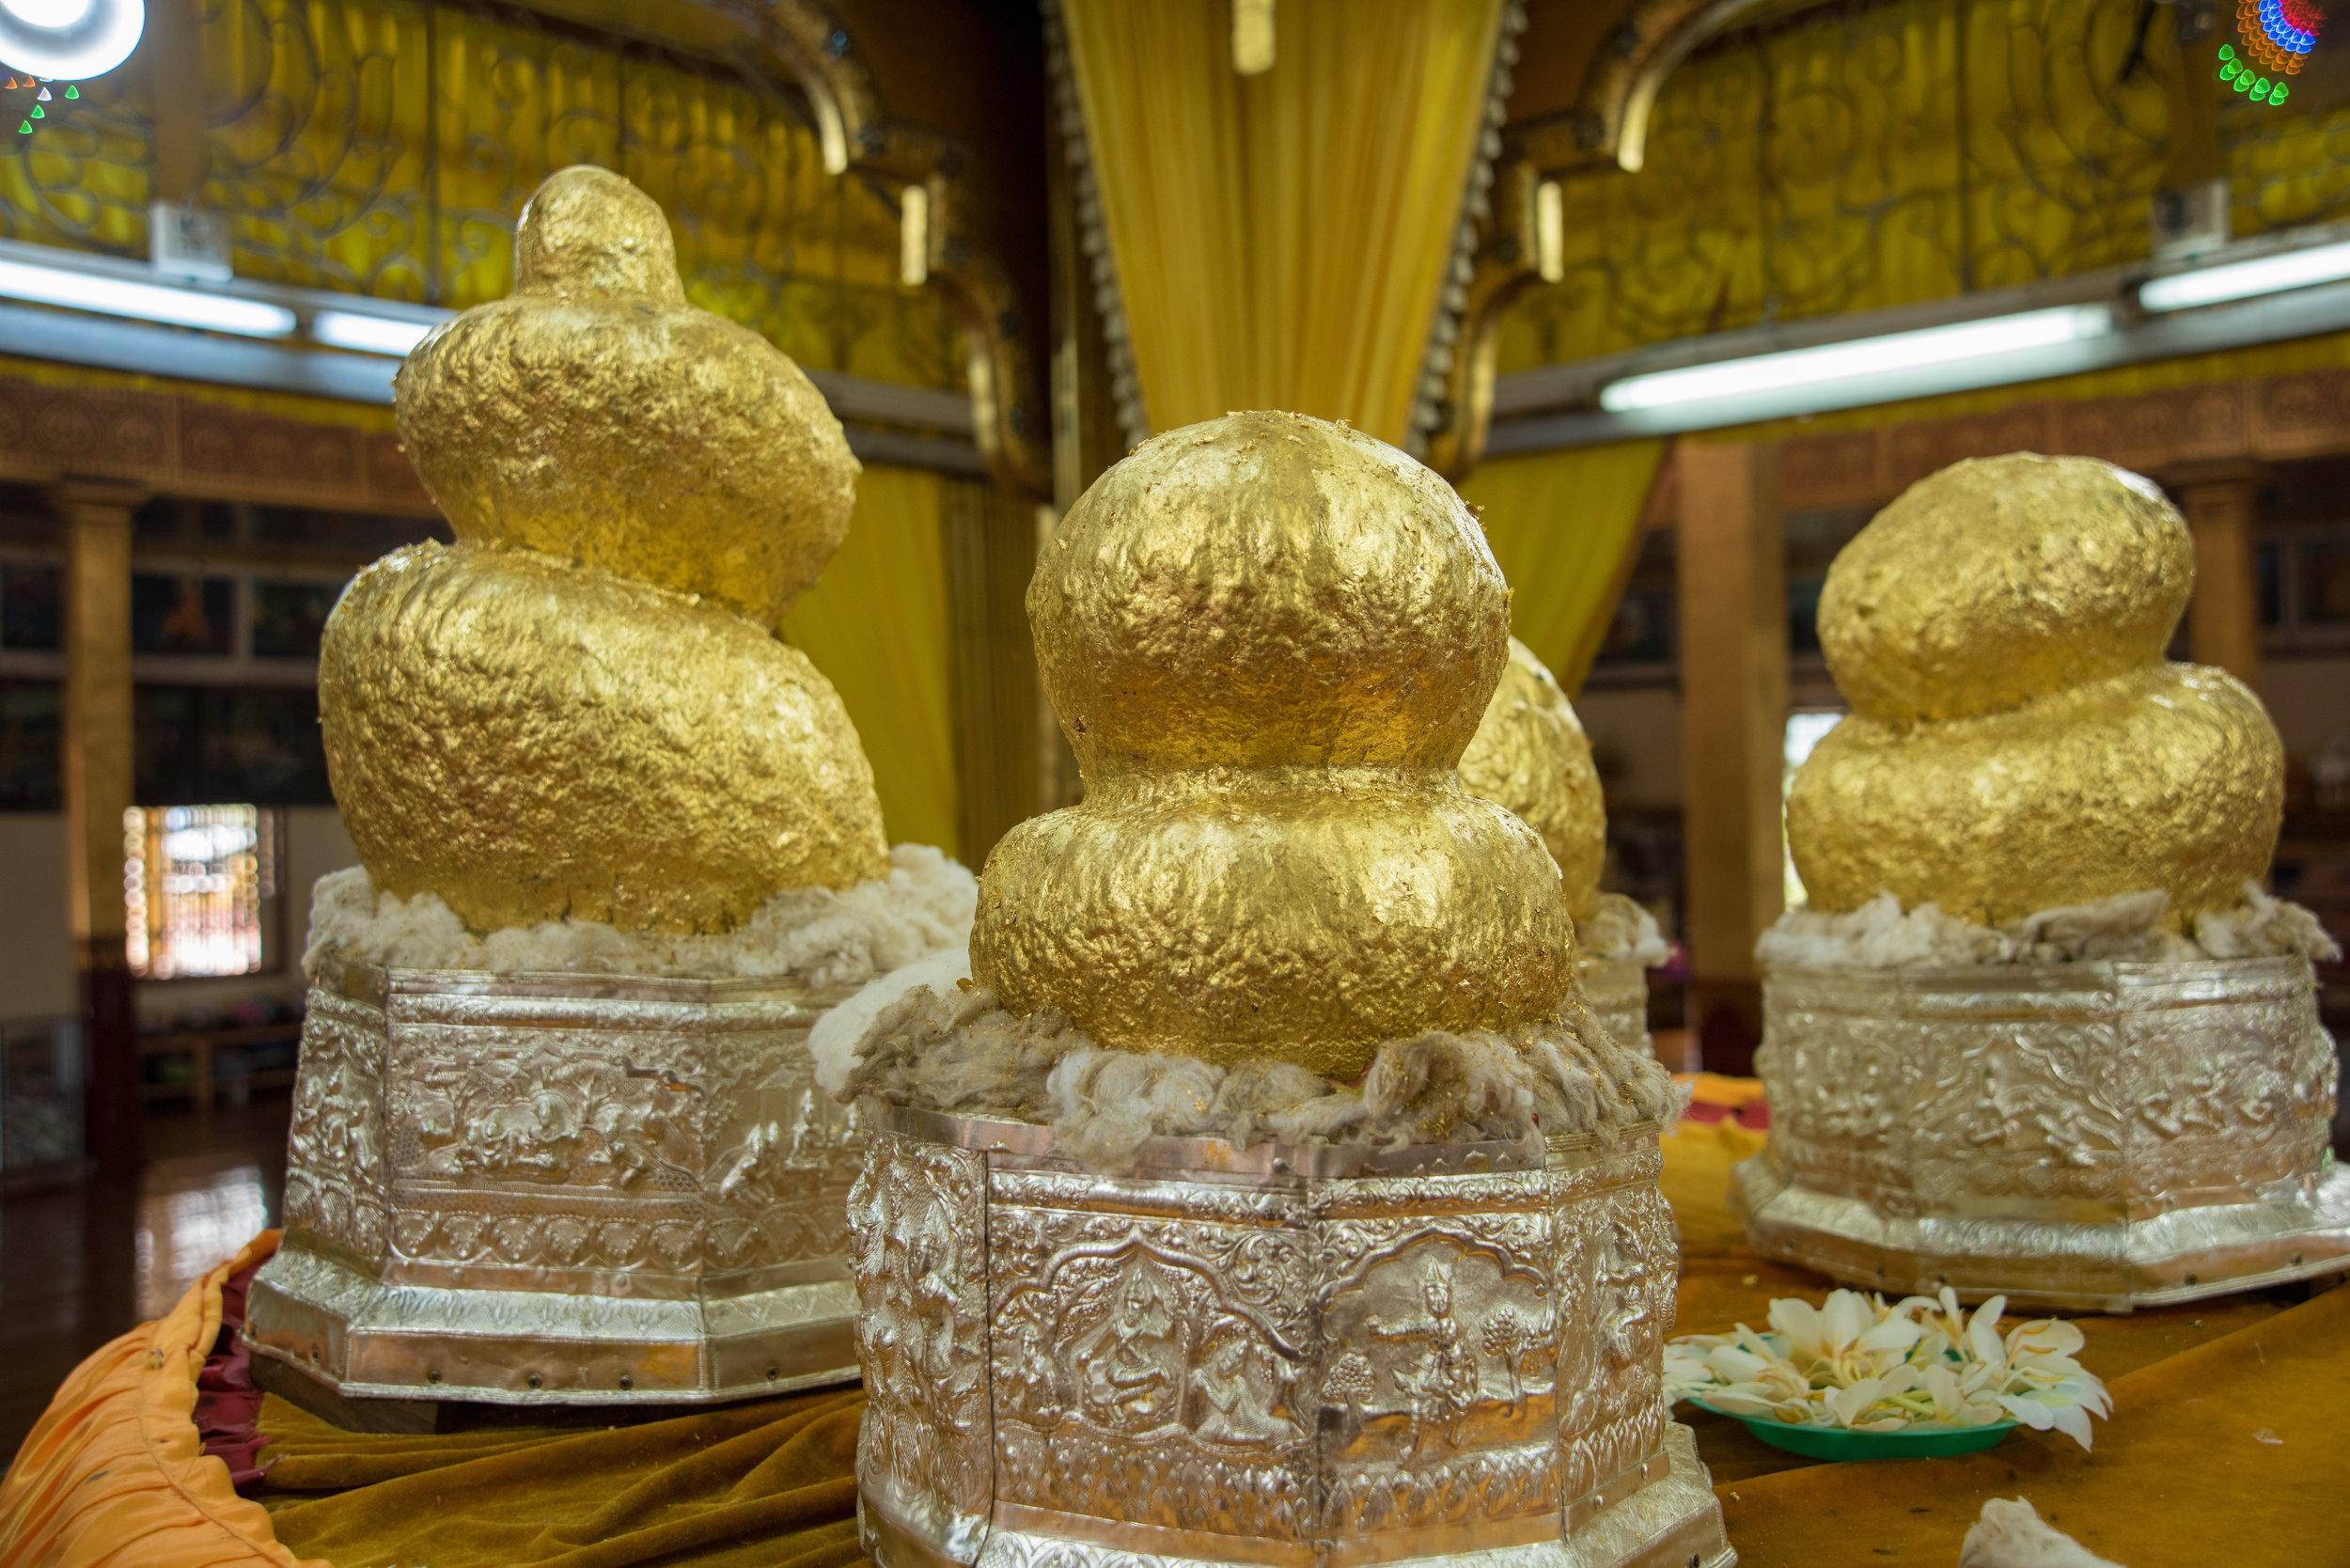 Gold Buddhas, Phaung Daw Oo Pagoda, Inle Lake, Myanmar